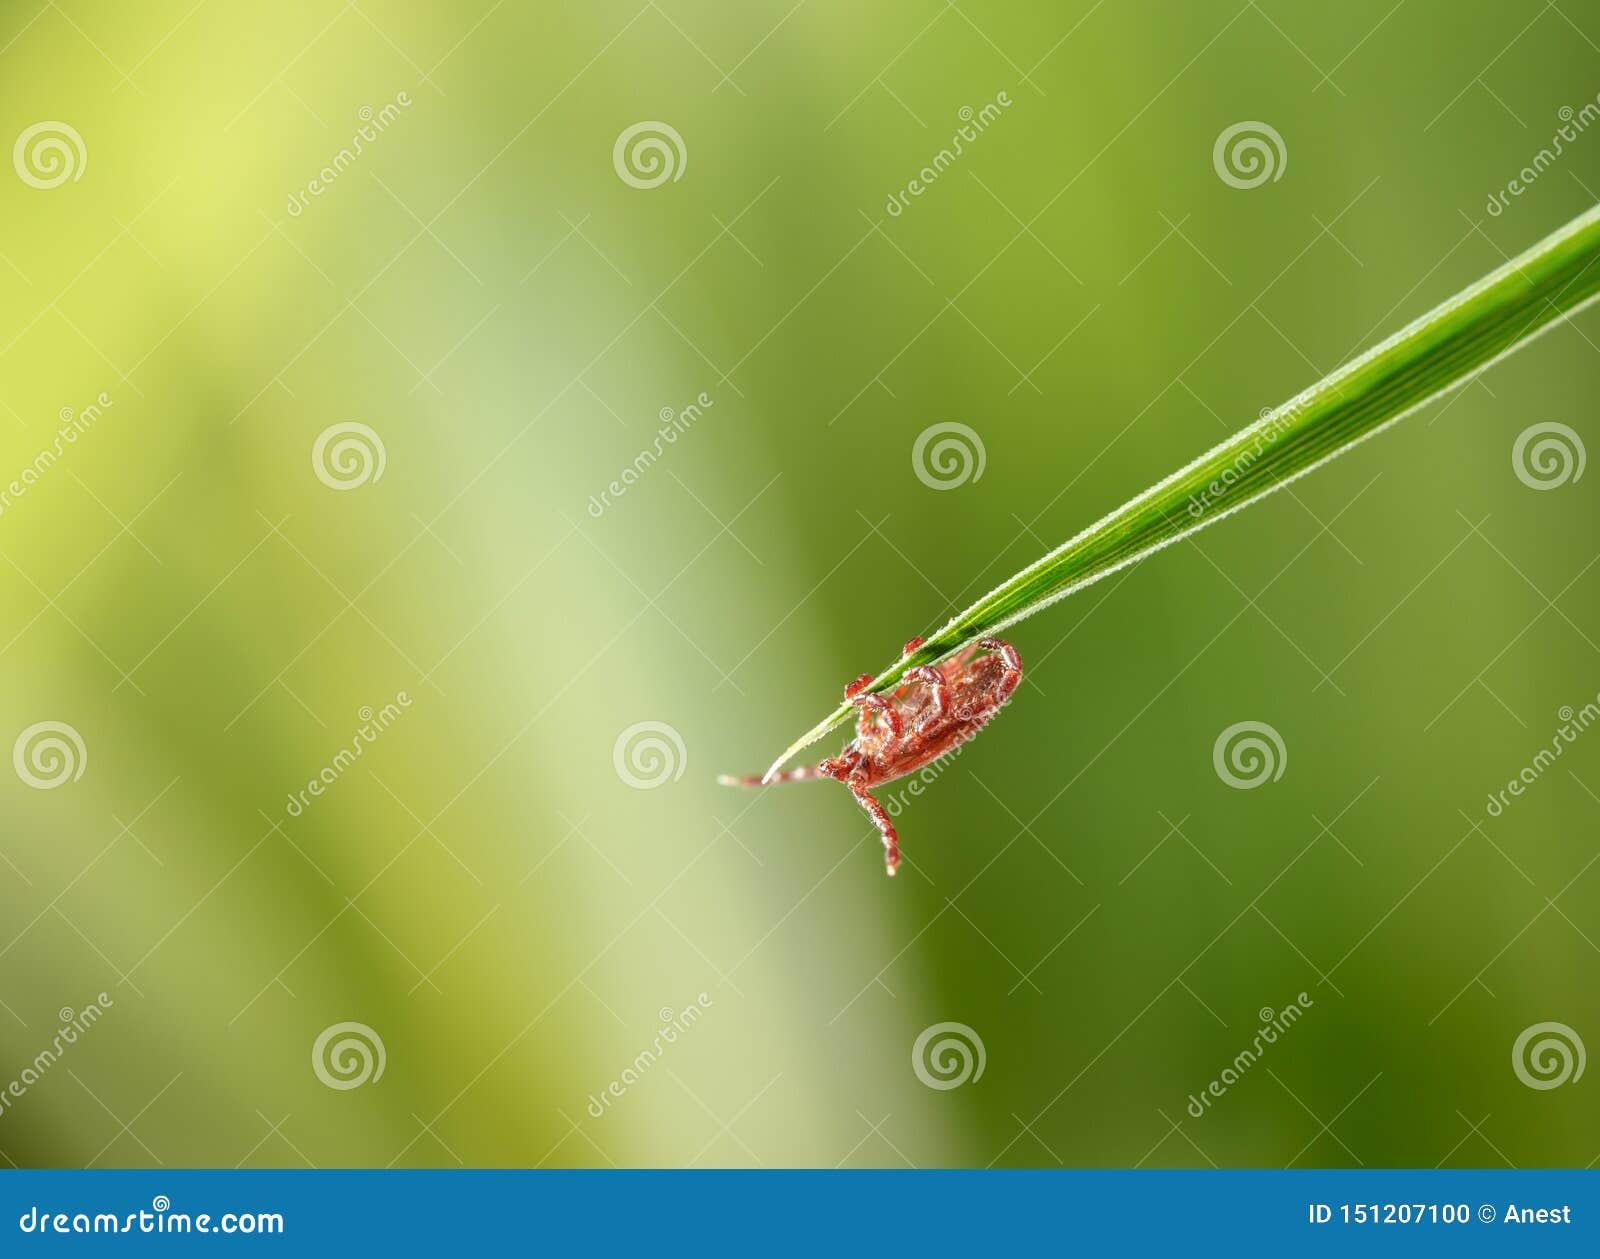 Waiting Tick on Grass